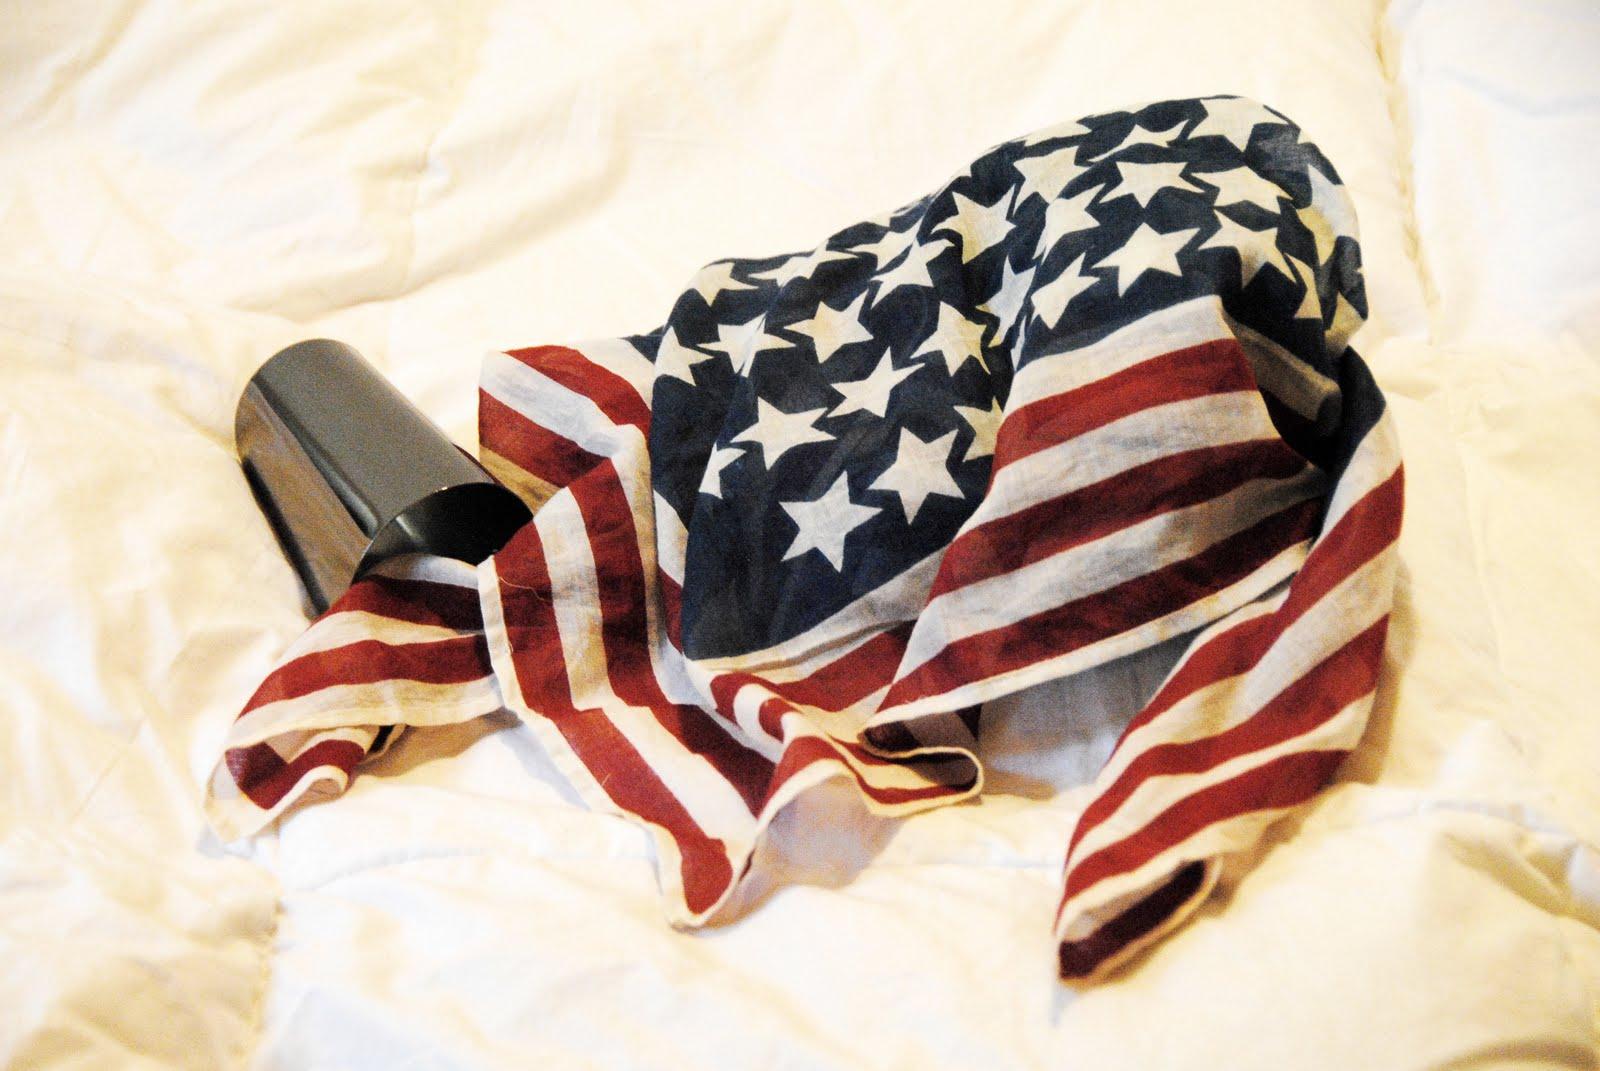 http://1.bp.blogspot.com/-lbHNtQVZLHc/TcwK8BpxE8I/AAAAAAAAAKY/8RCo8jElZOo/s1600/foulard+bandiera.jpg